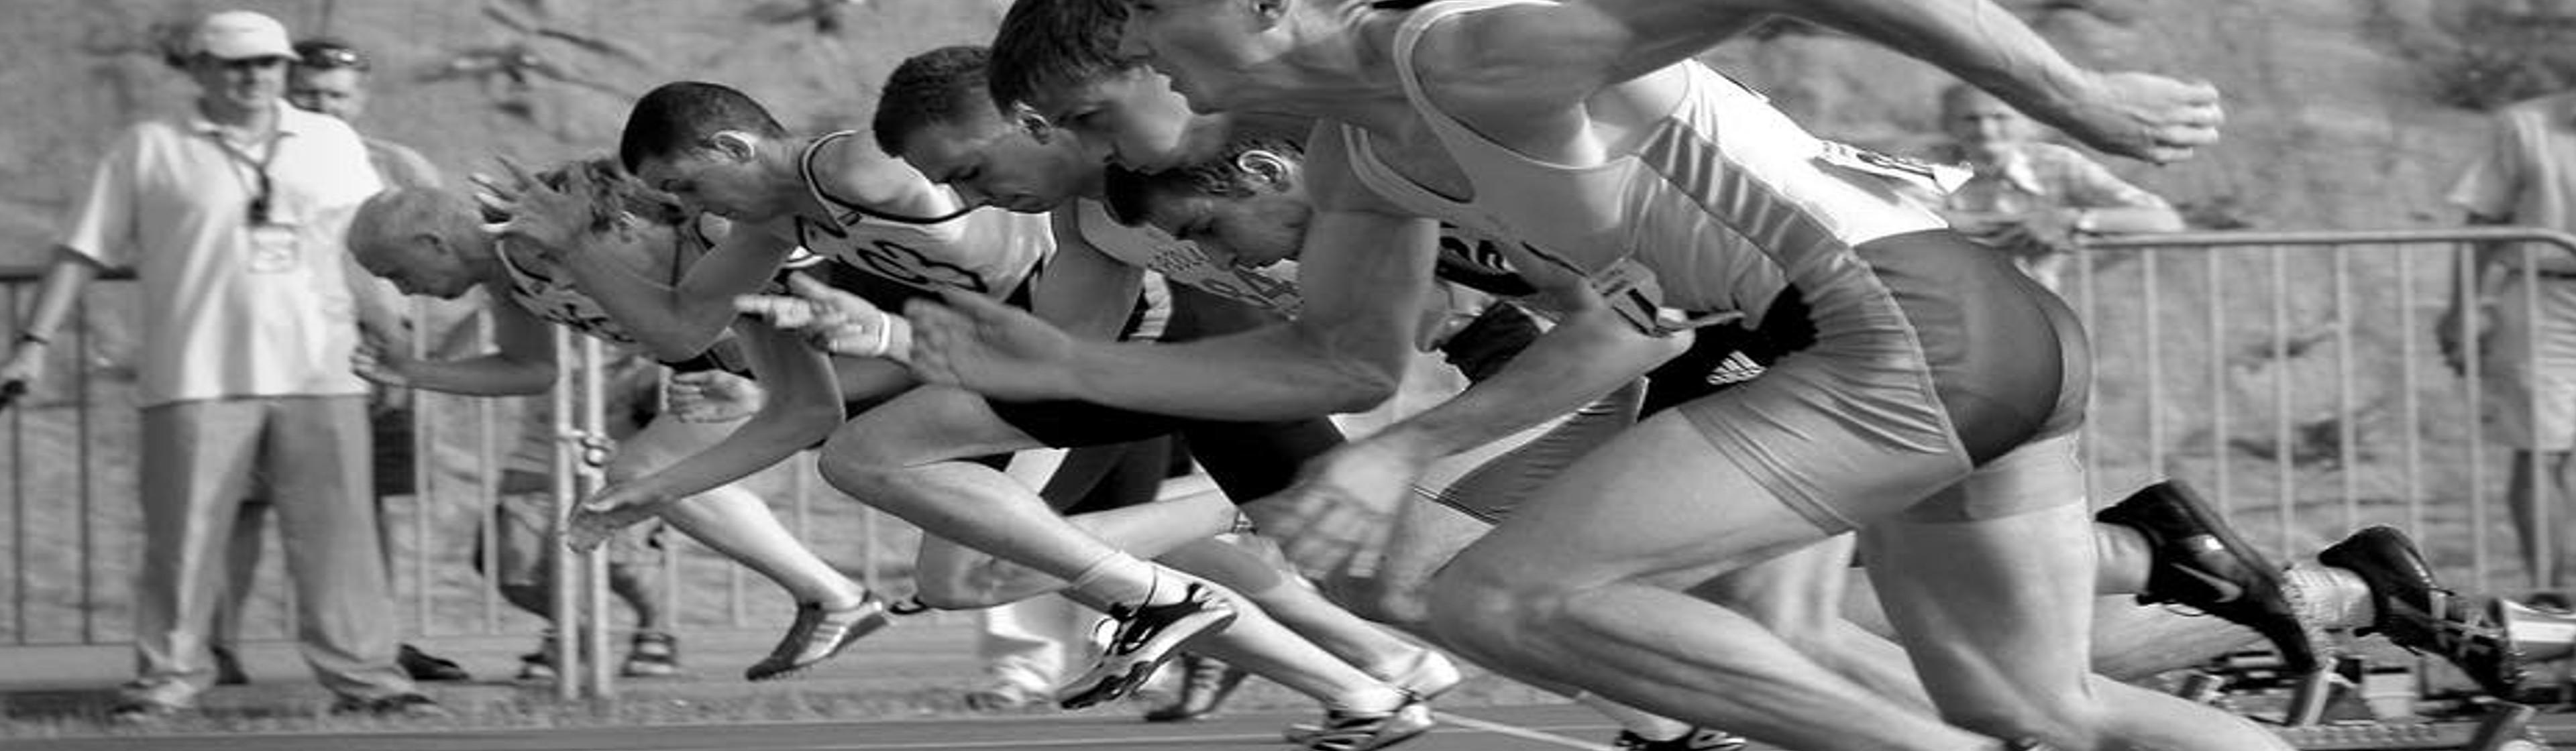 Footwear Friday: Top 5 Best Men's Trainers